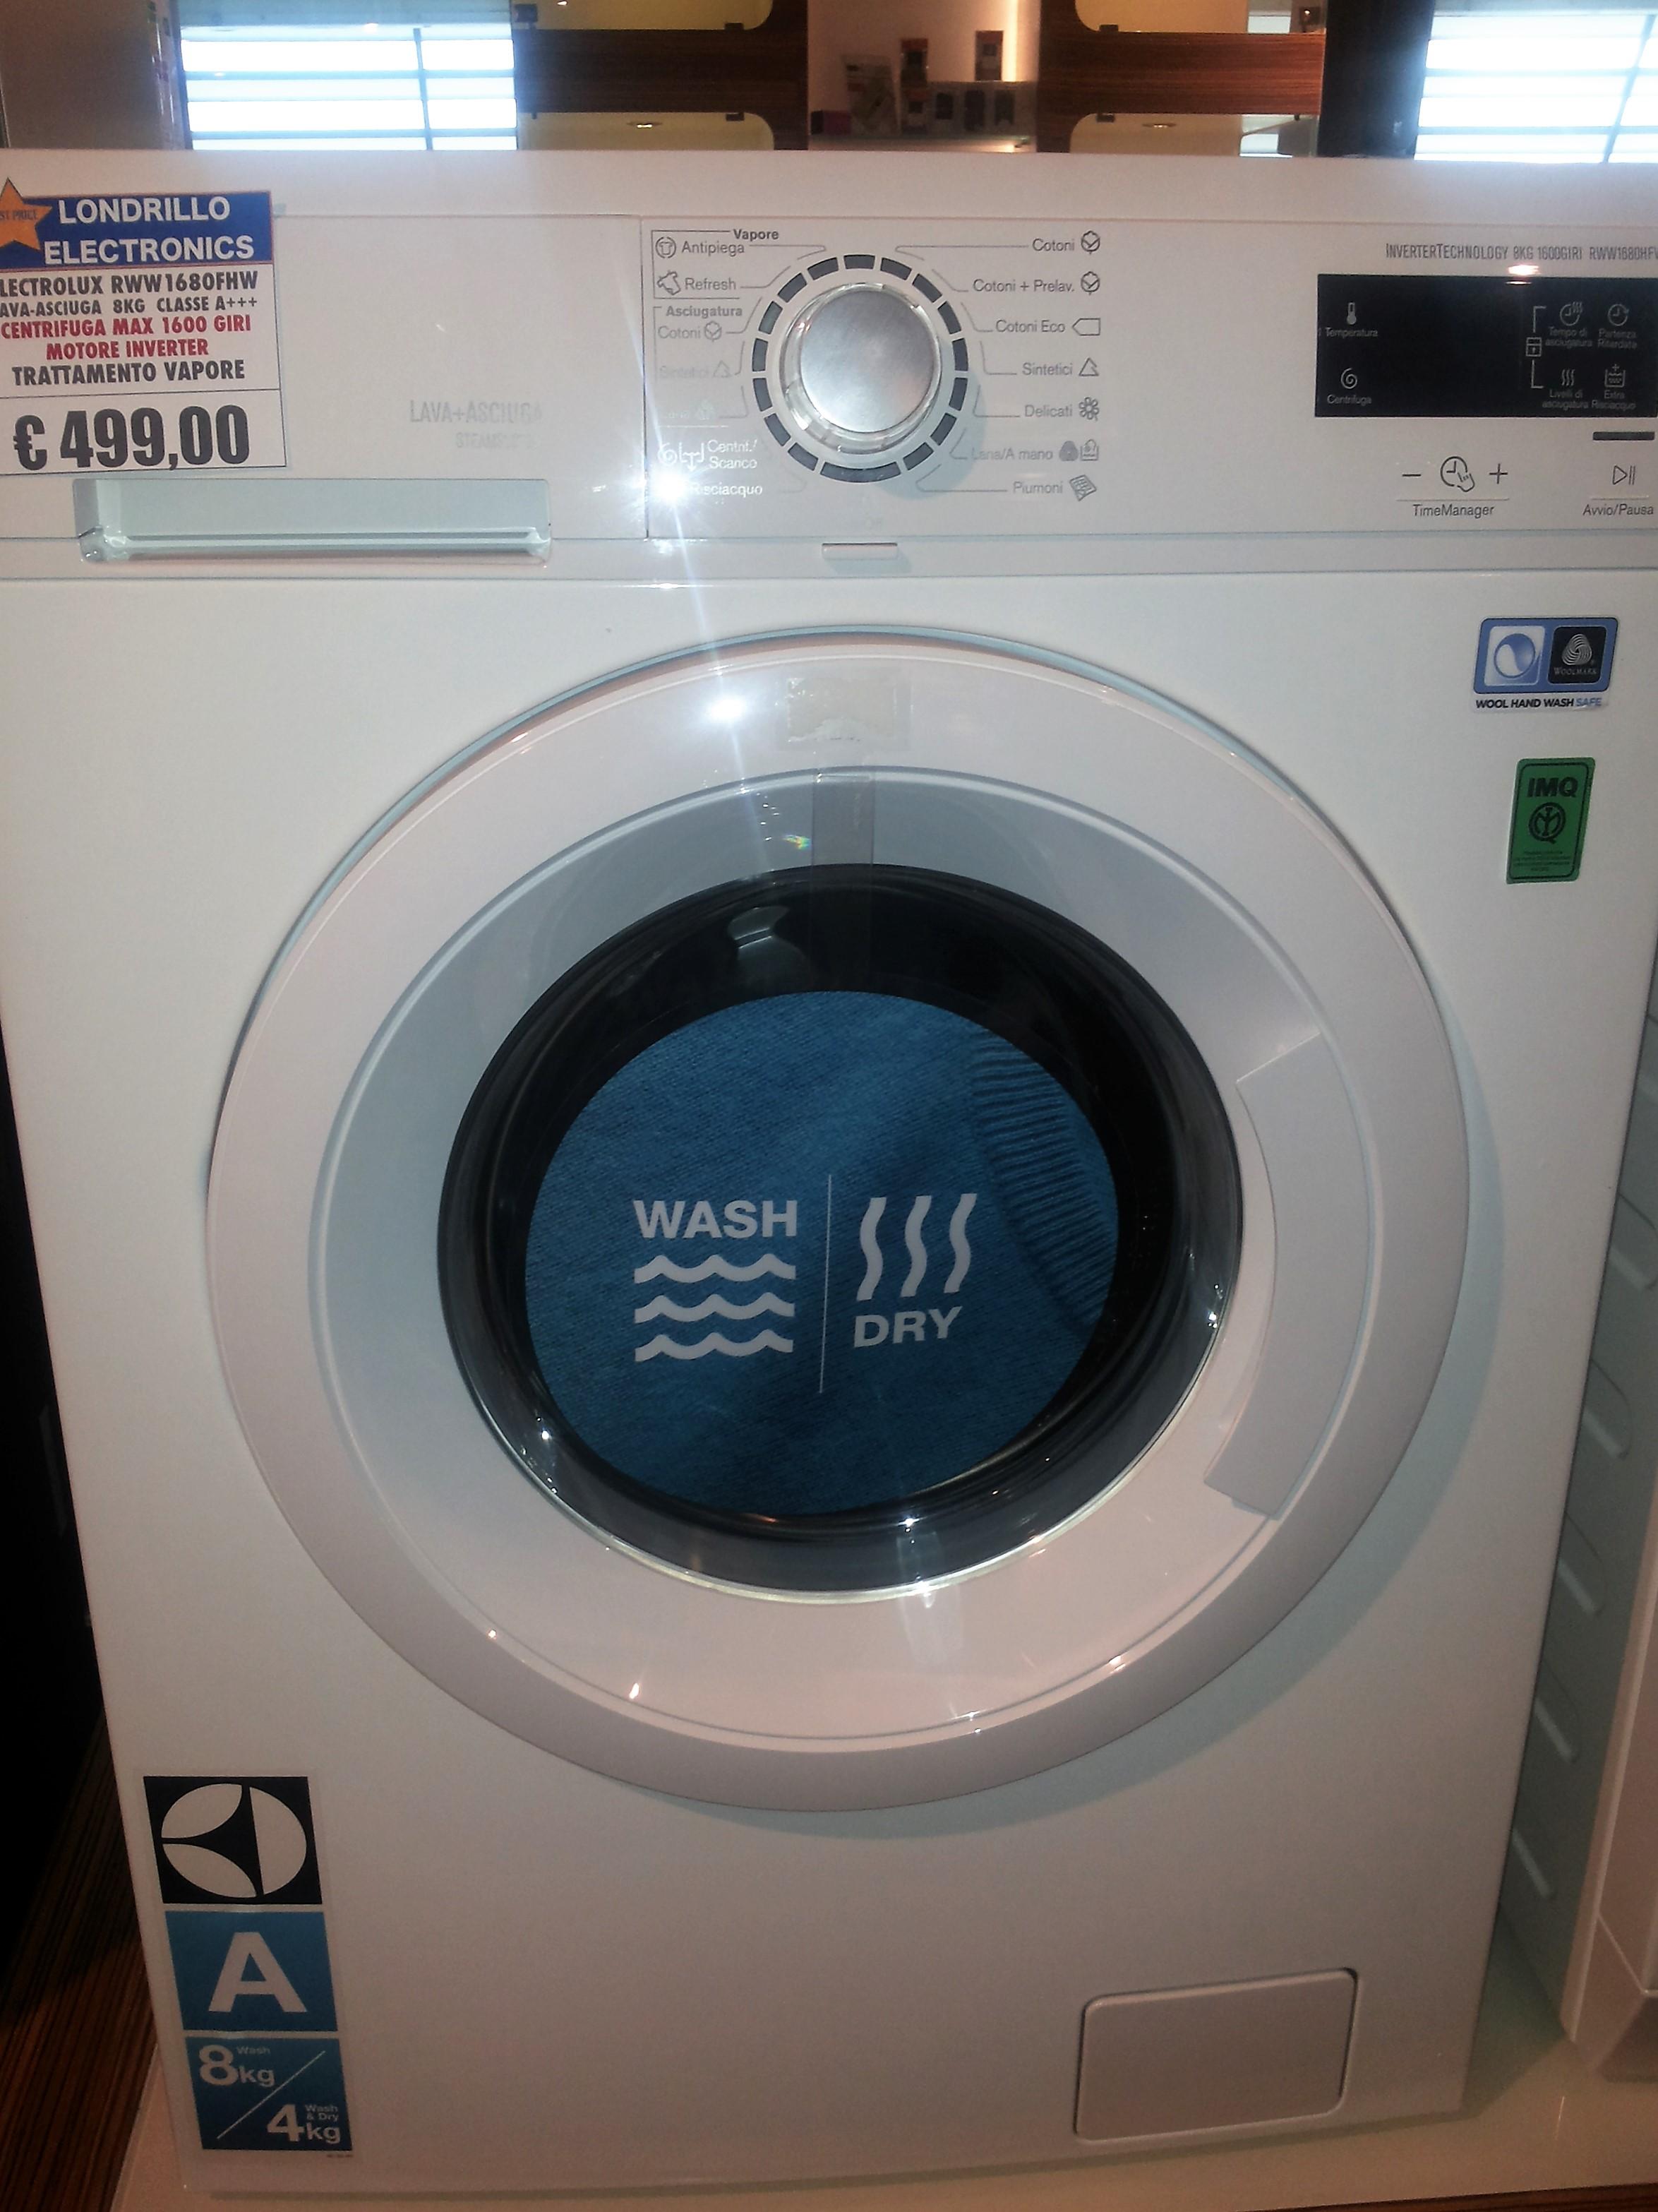 londrillo electronics elettronica lavatrice electrolux